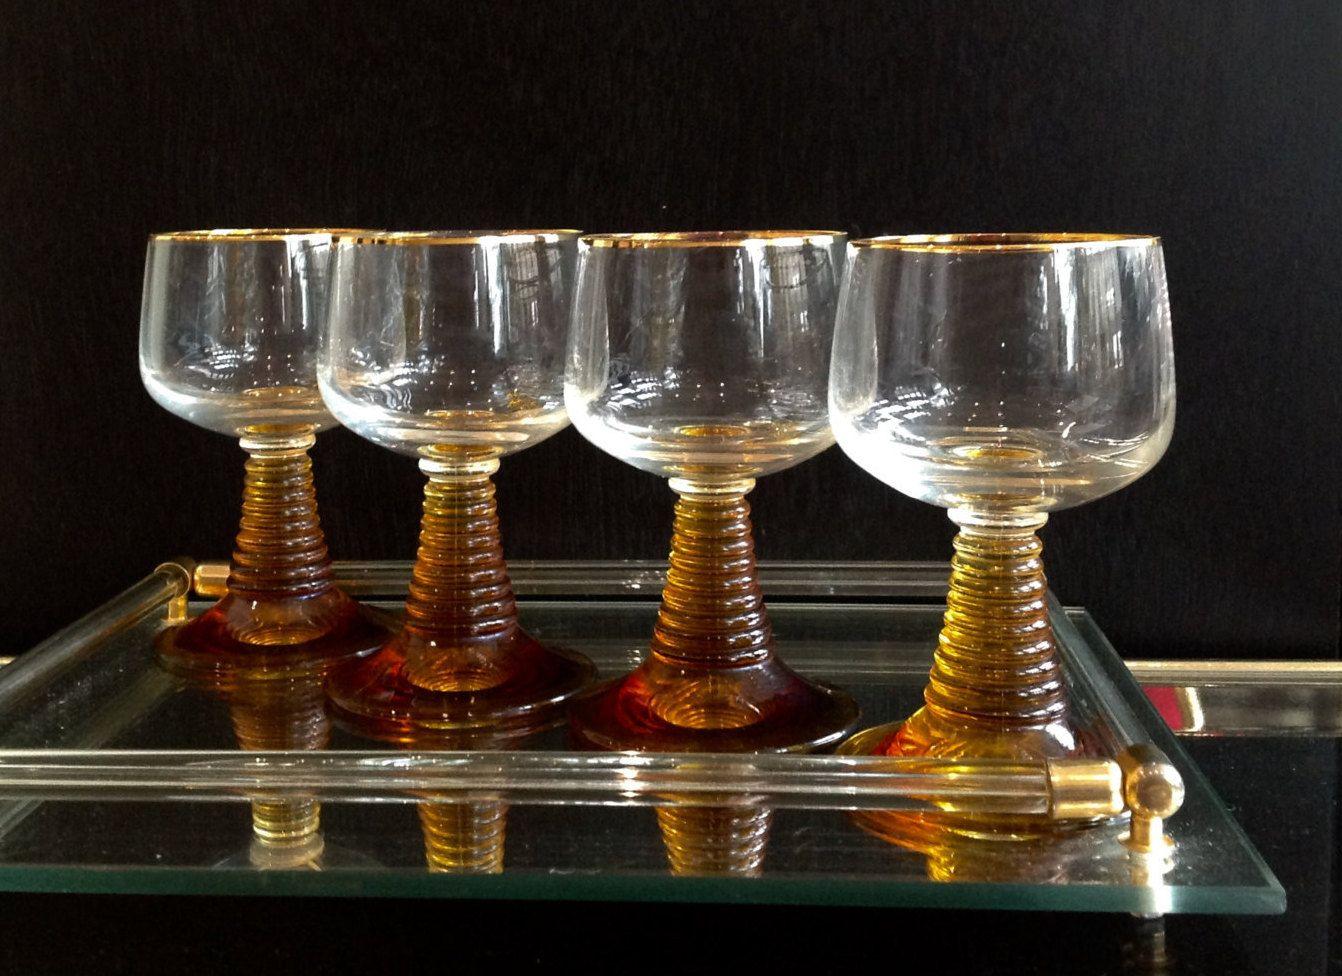 b271de1abf15 Vintage Roemer Wine Glasses - Schott Zwiesel Beehive Stem - Amber - Gold  Trim - Gold by VintageModernHip on Etsy